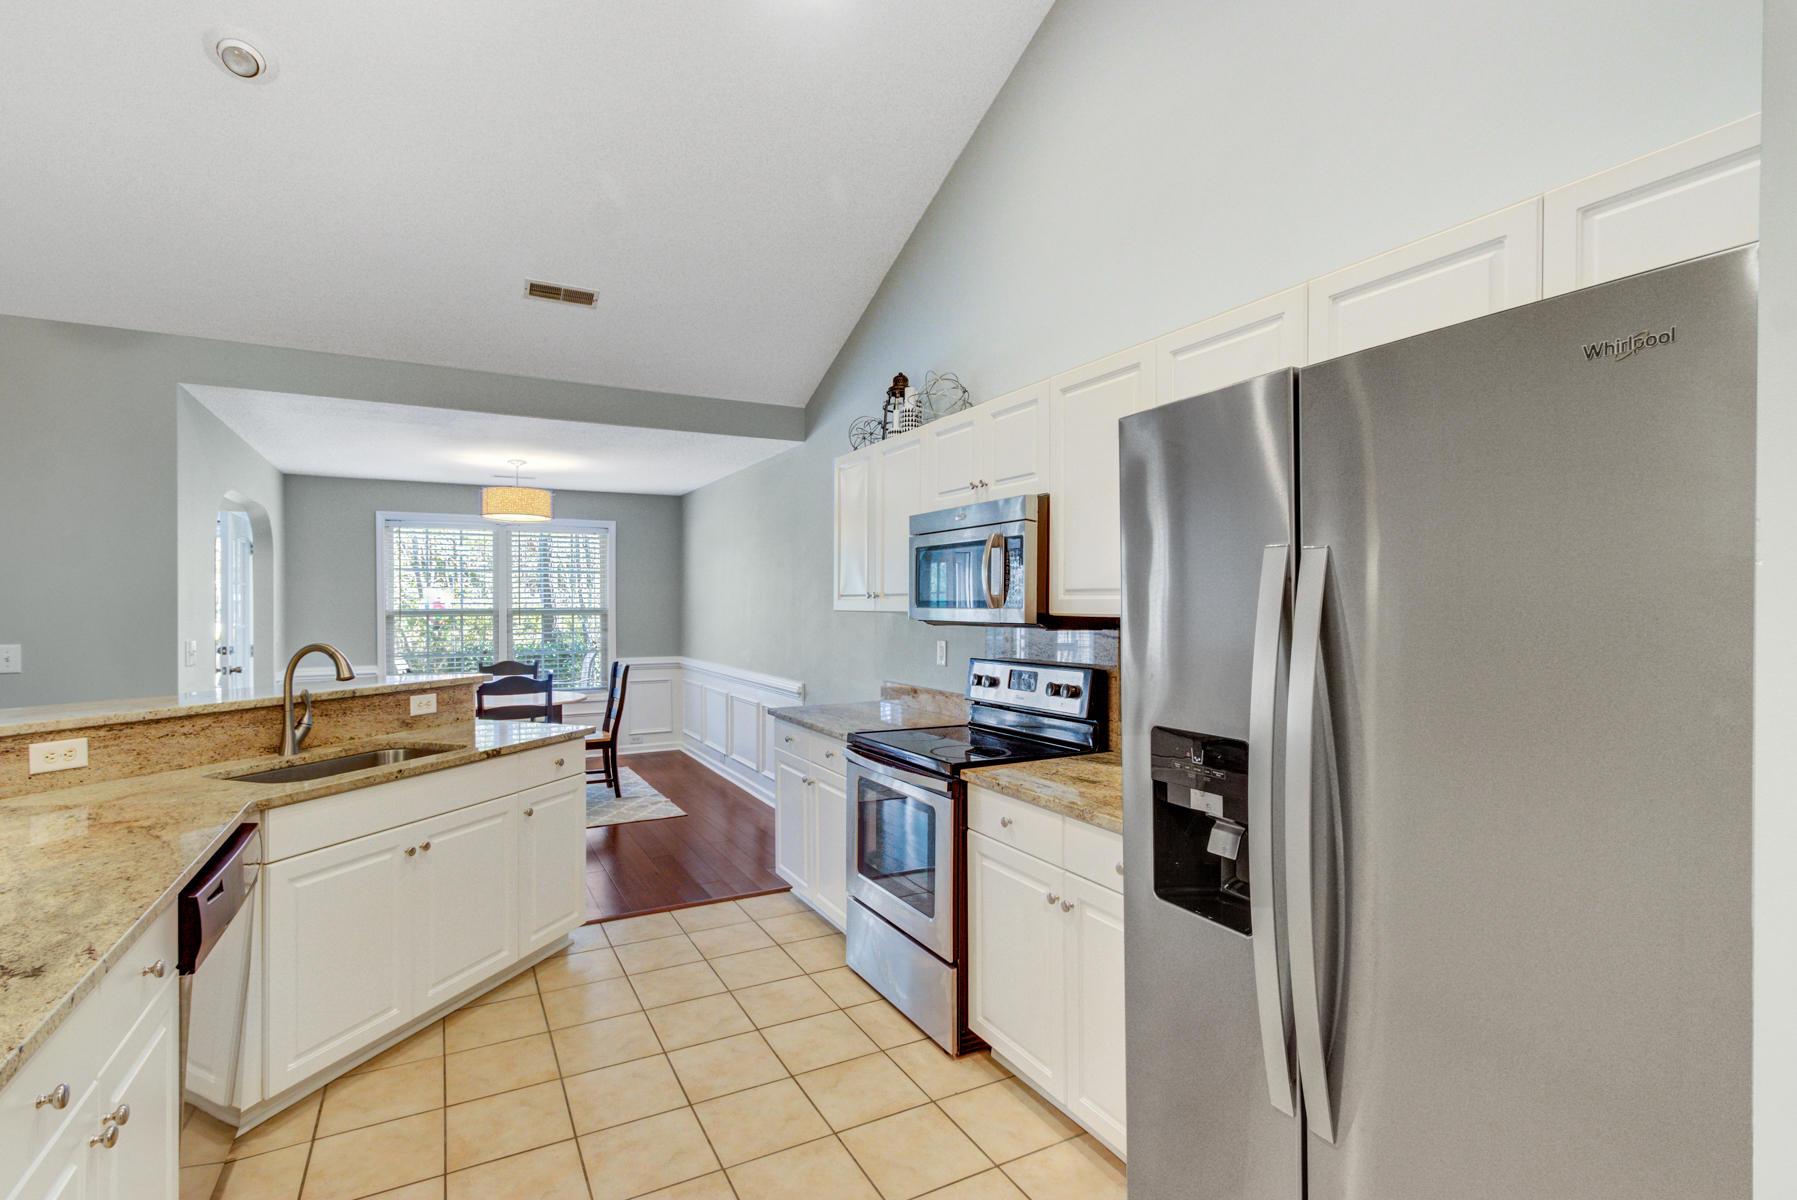 Park West Homes For Sale - 3444 Wellesley, Mount Pleasant, SC - 17